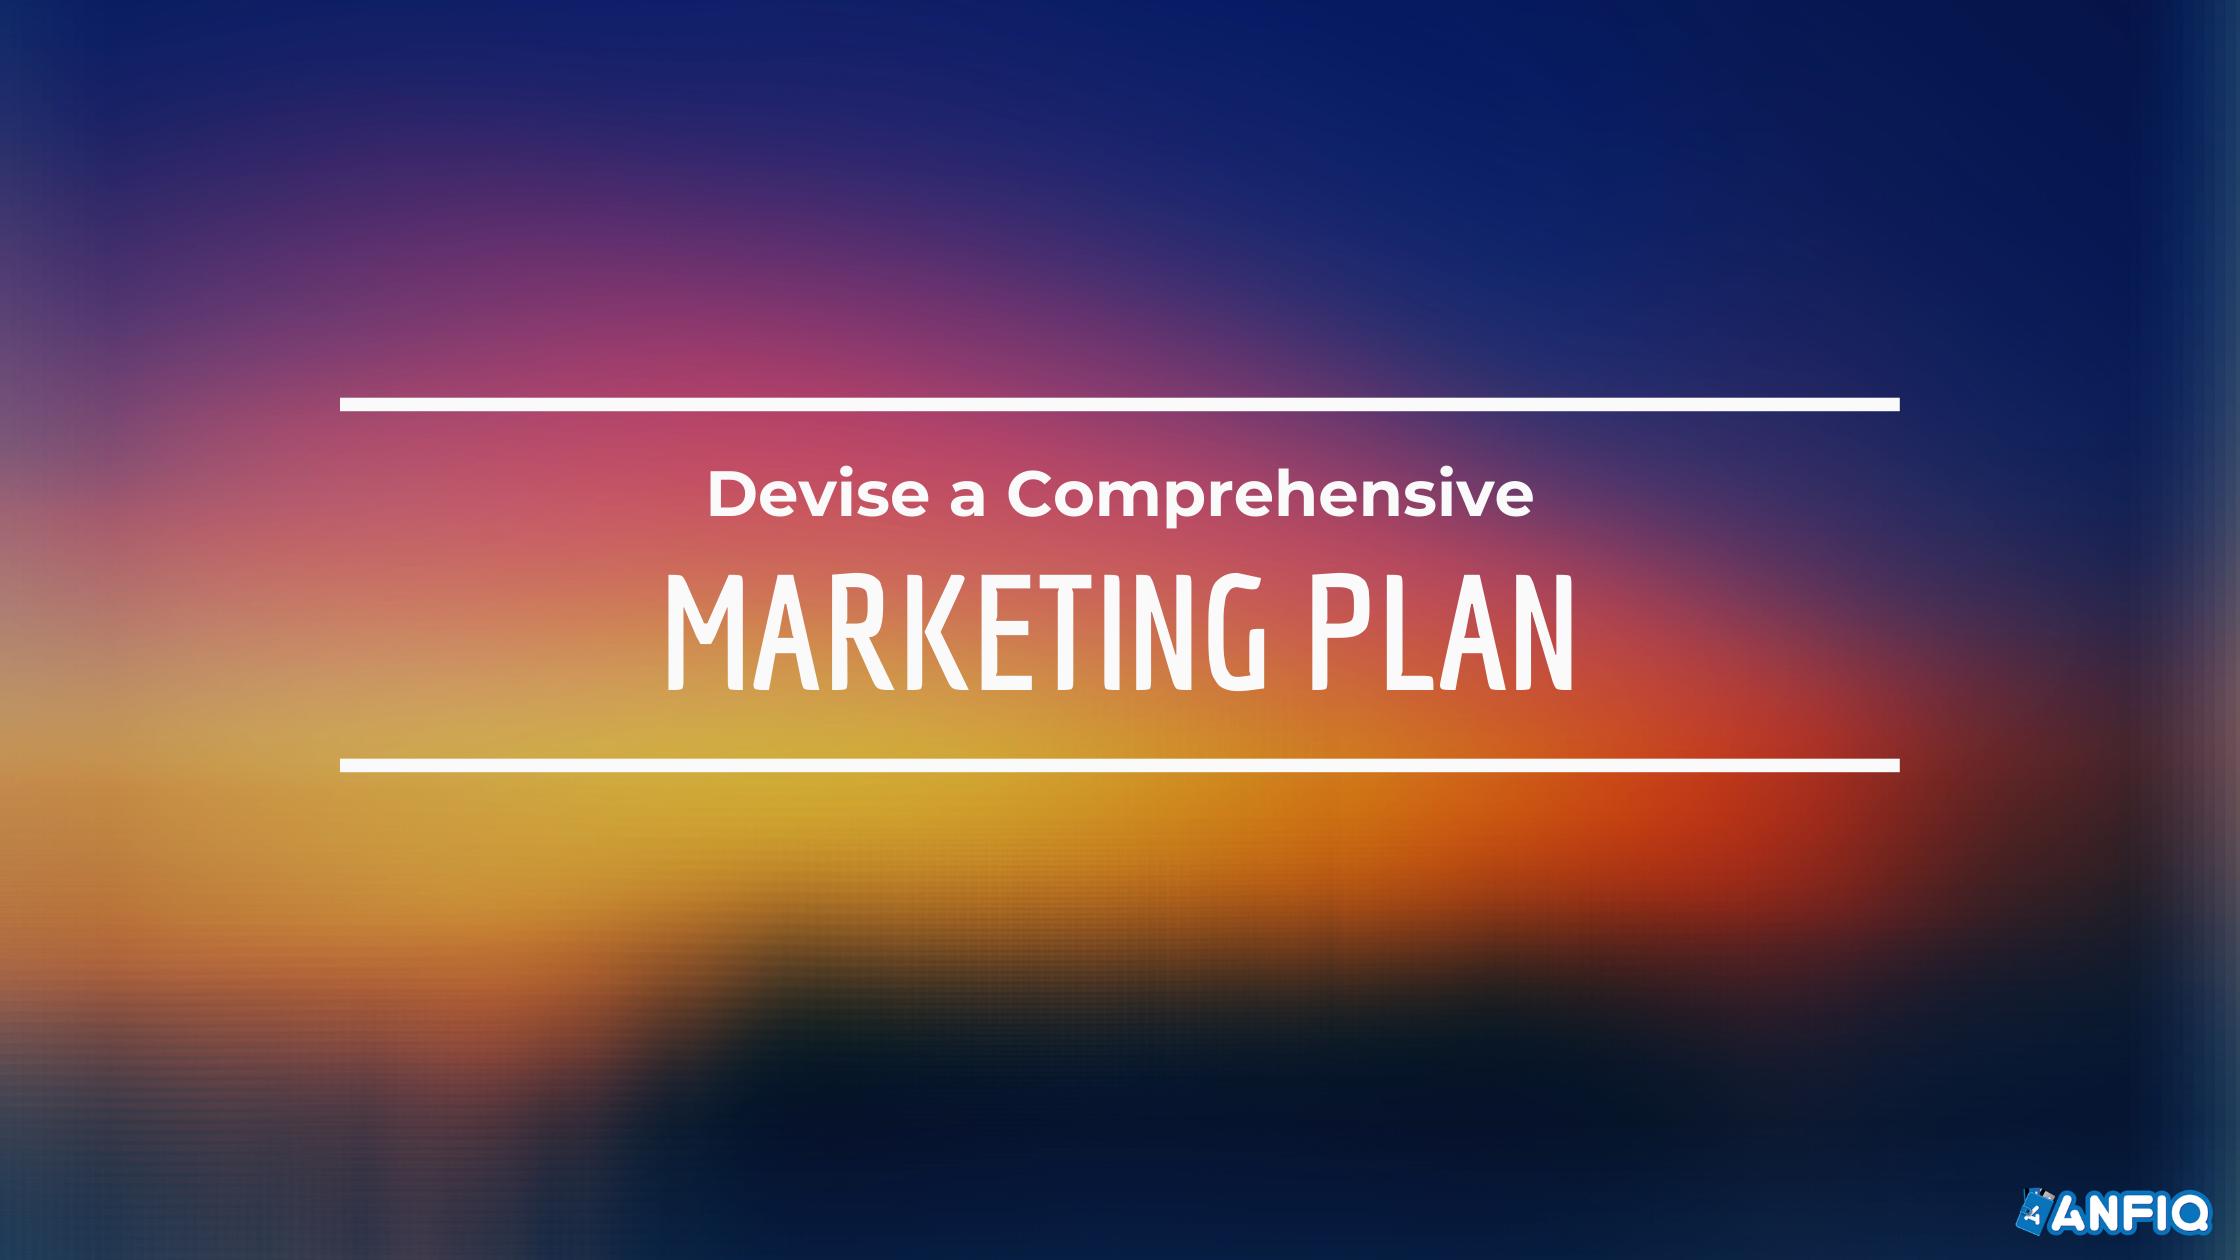 Devise a Comprehensive Marketing Plan